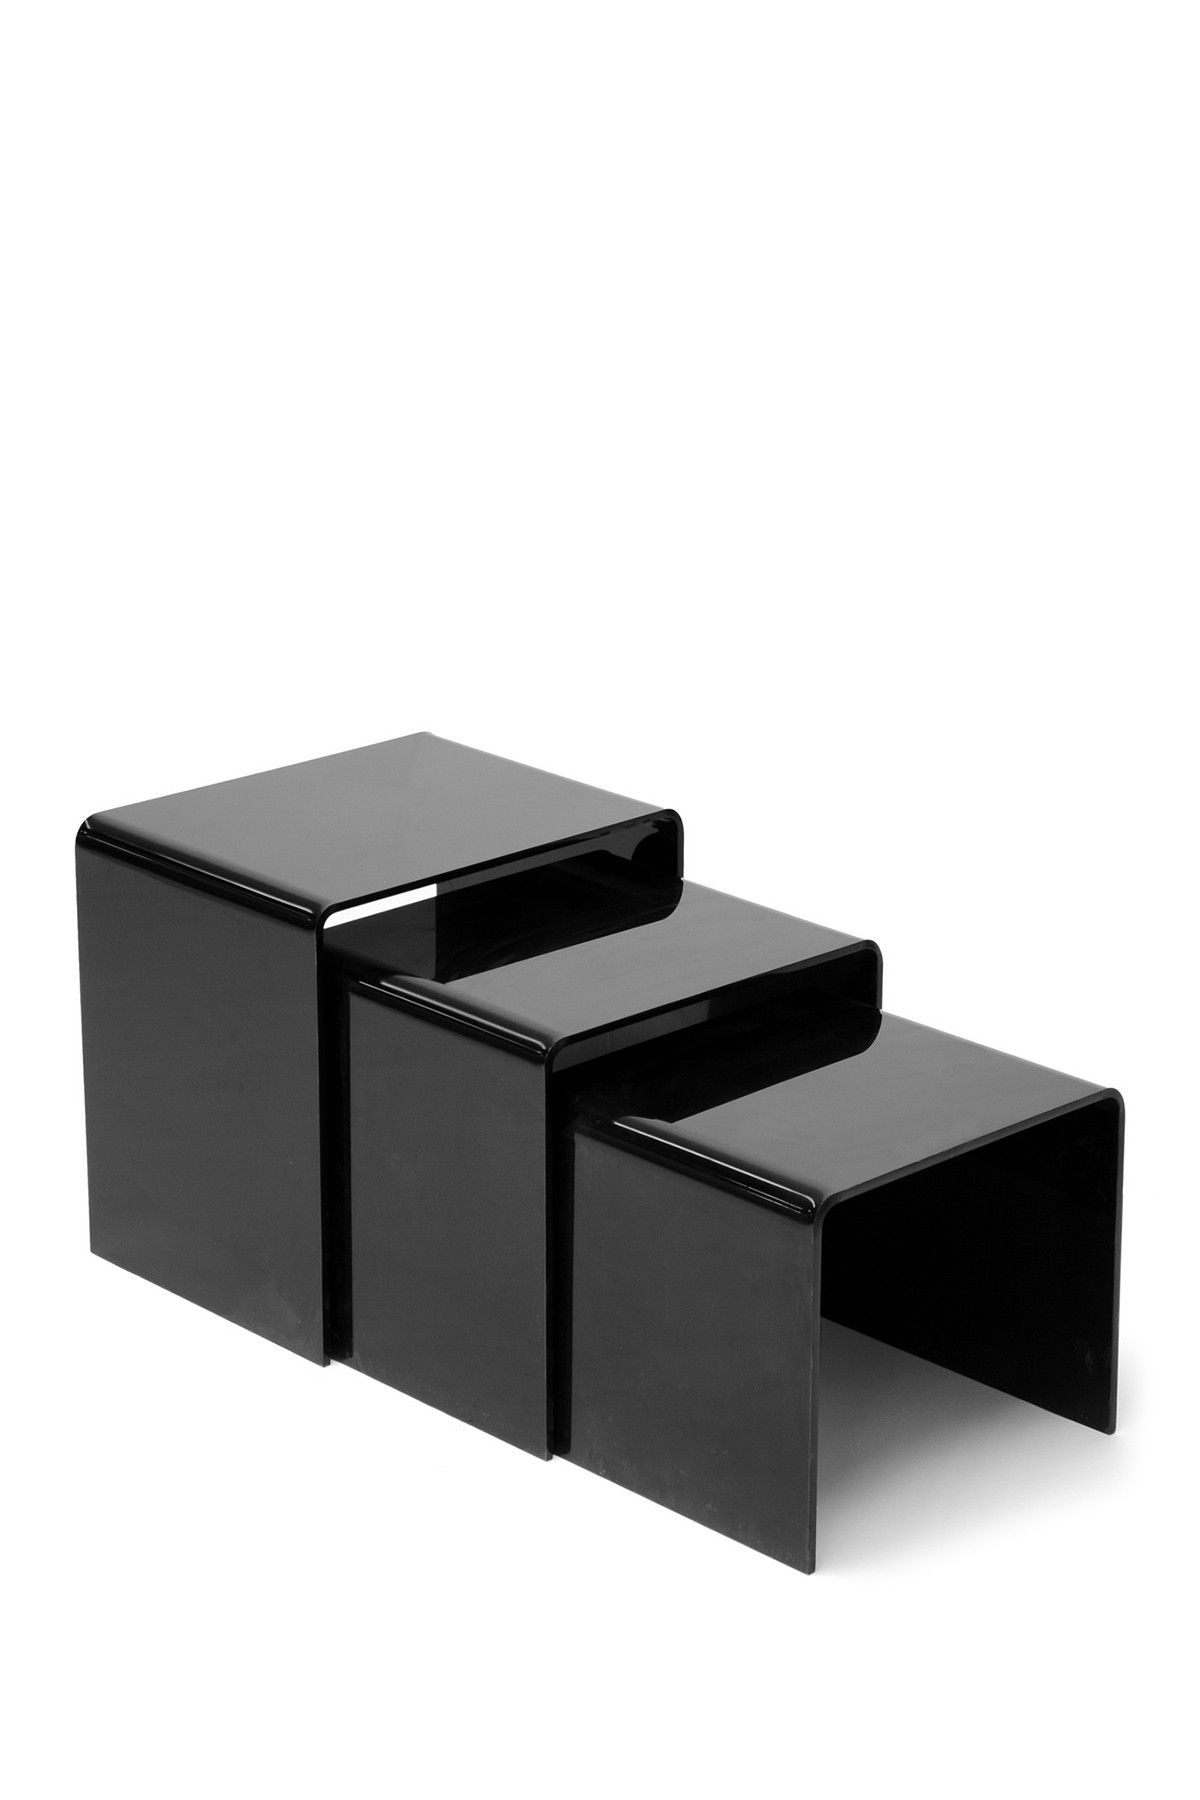 Mercutio black acrylic nesting table set set of 3 interiors wholesale interiors mercutio black acrylic nesting table set set of 3 at nordstrom rack free shipping on orders over 100 watchthetrailerfo